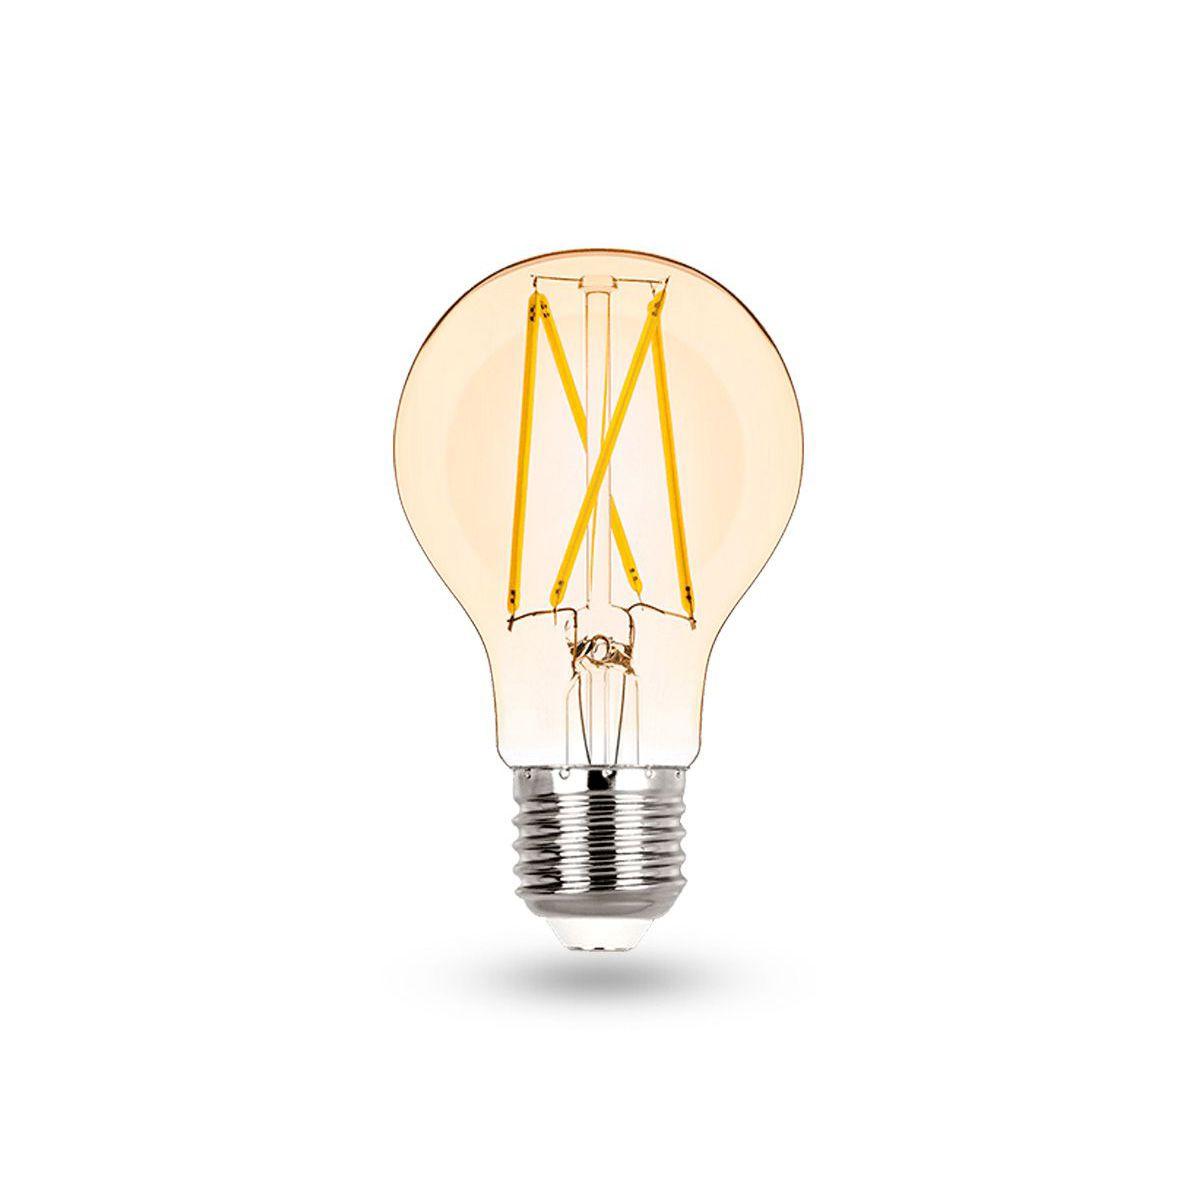 Lâmpada Filamento LED A60 2700K E27 100-240V